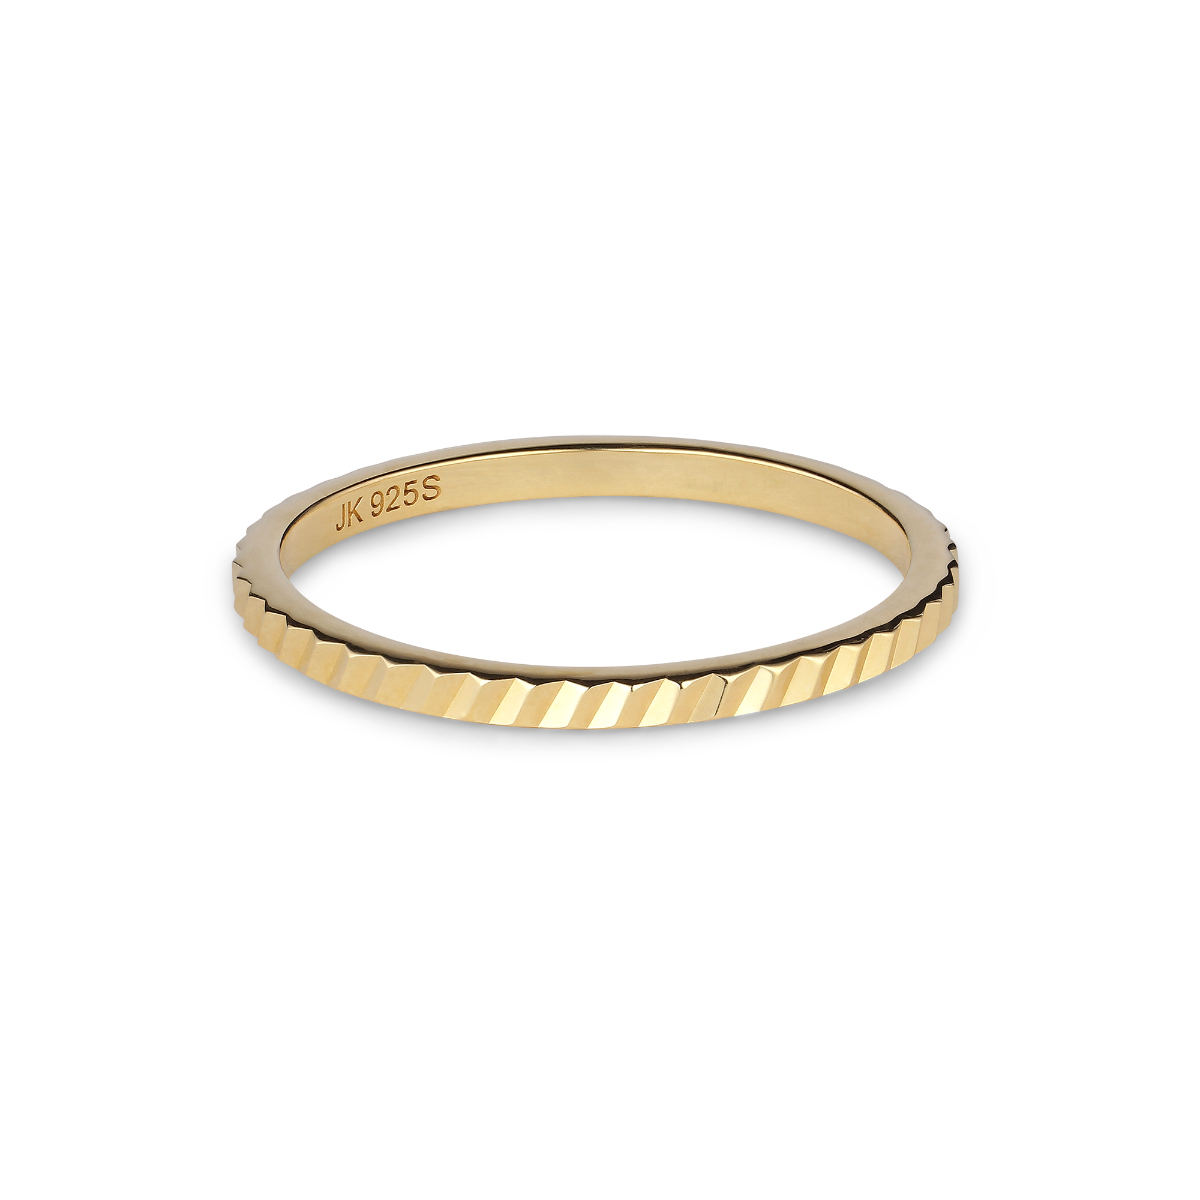 Jane Kønig small Reflection ring, guld, 54